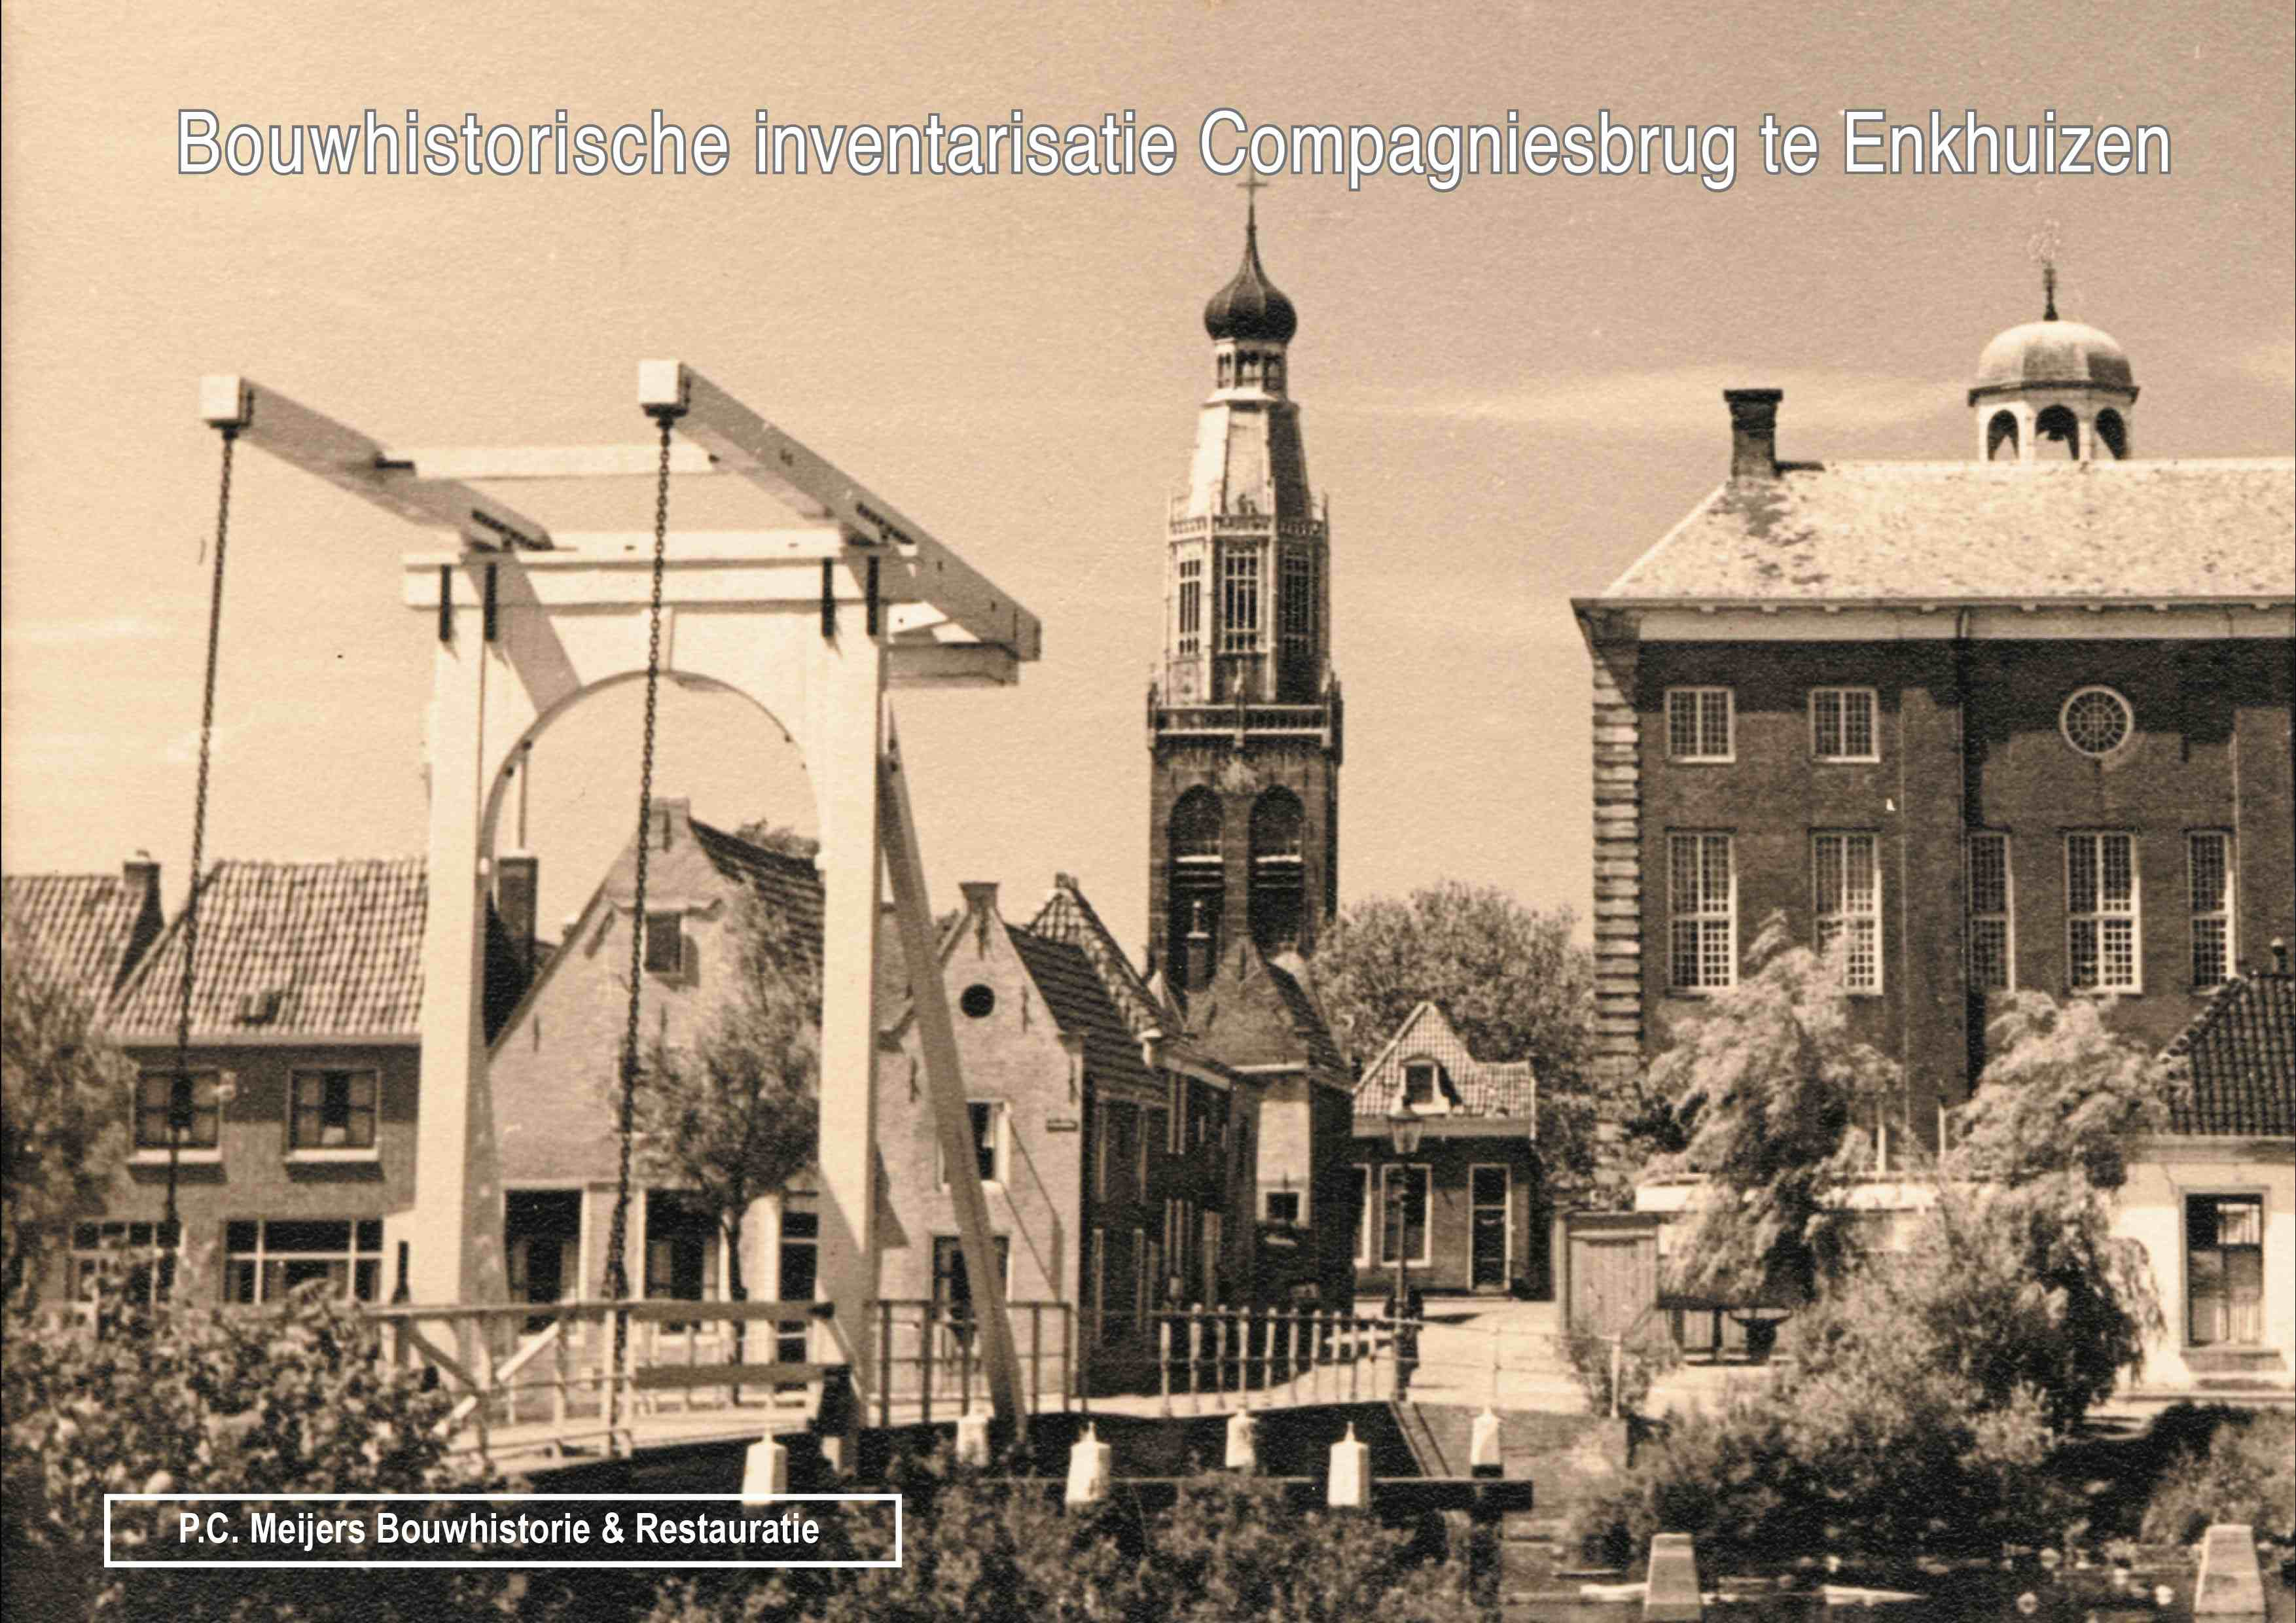 Compagniesbrug, Enkhuizen